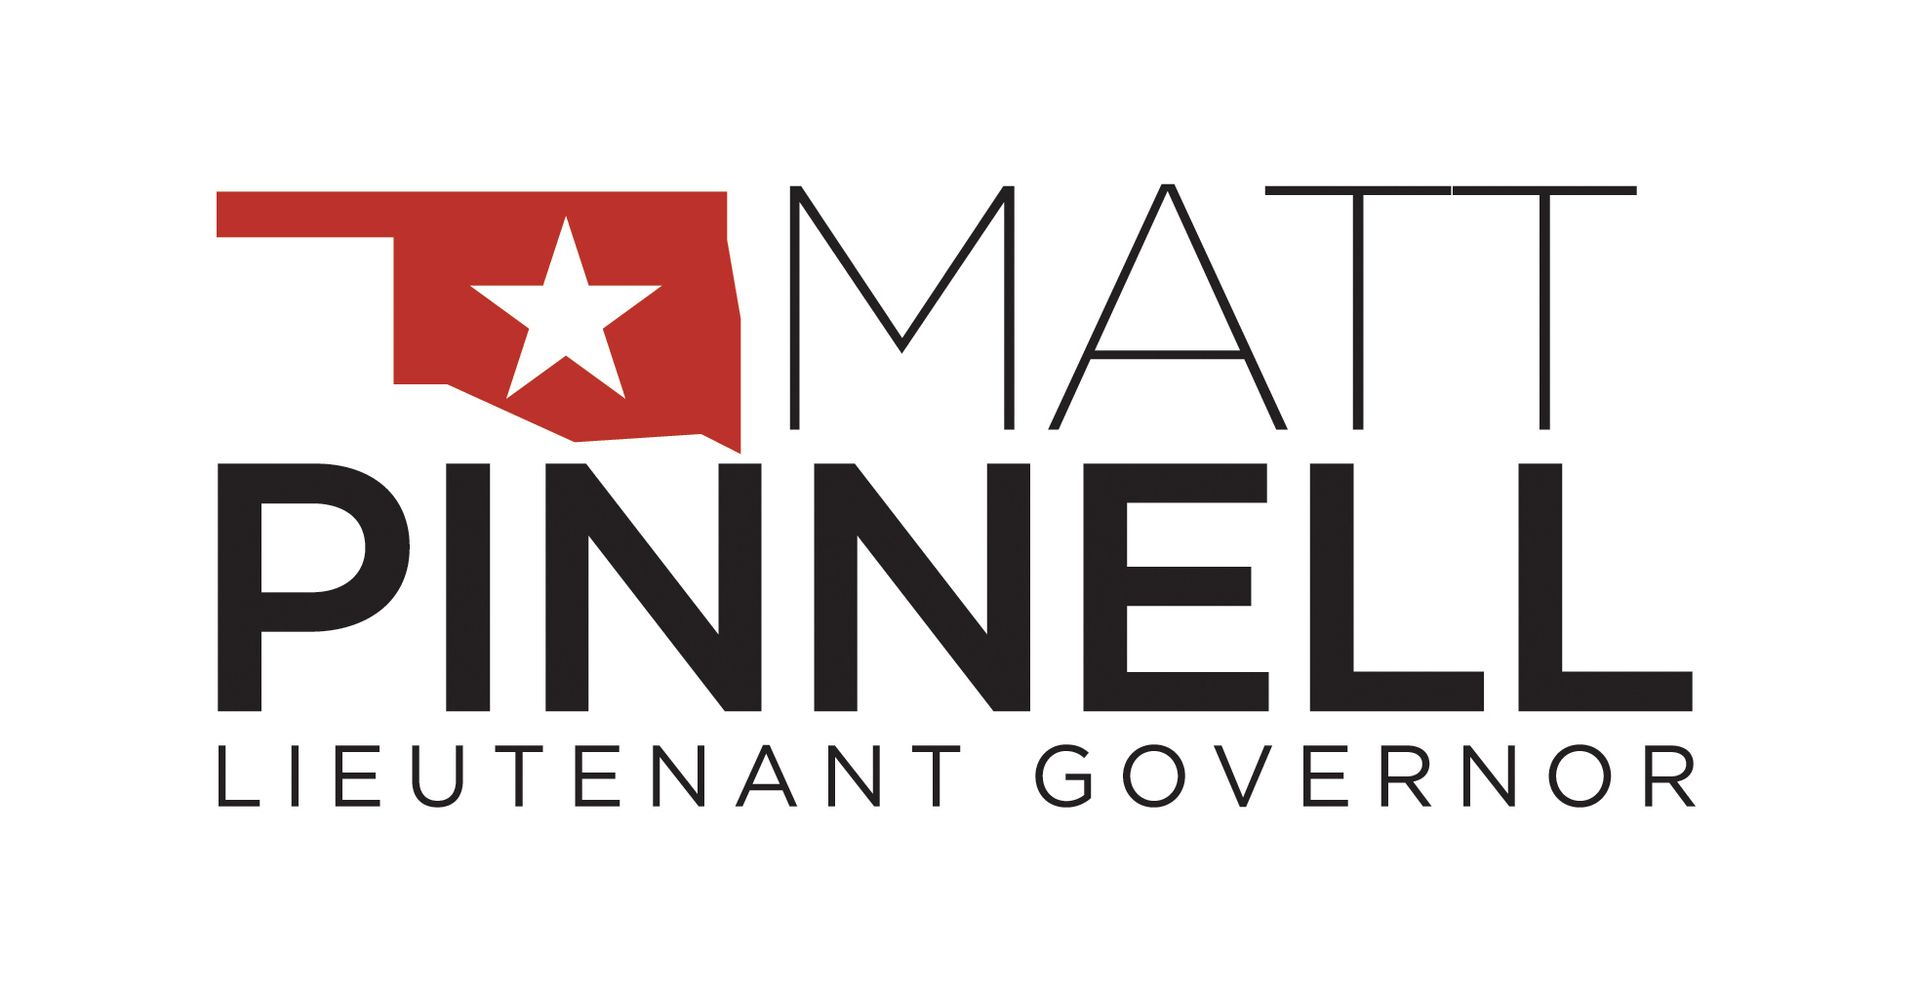 Pinnell matt logo b